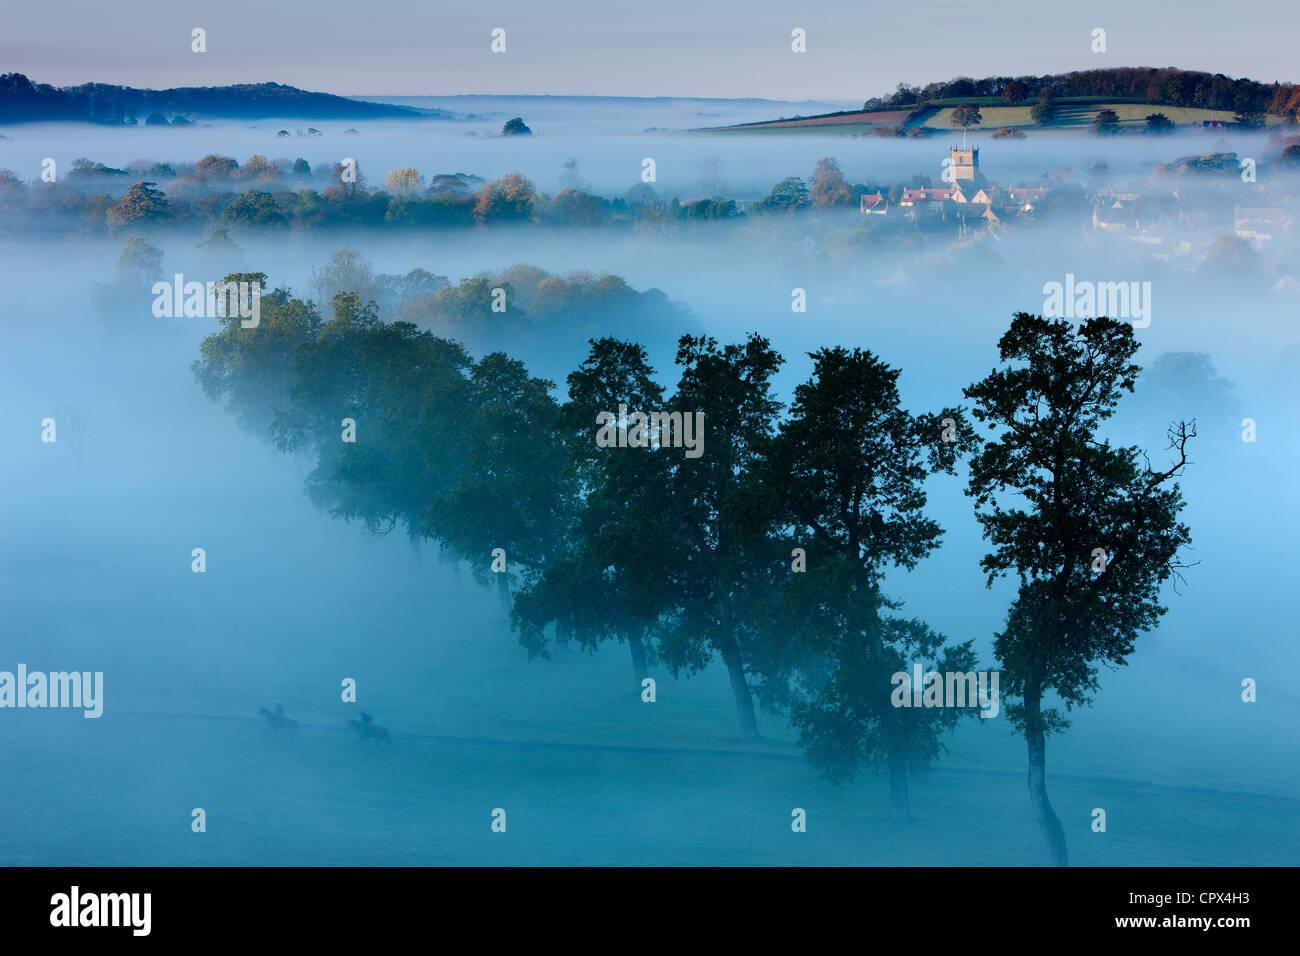 Una mañana de otoño, Misty Milborne Puerto, en el Dorset y Somerset Frontera, Inglaterra Imagen De Stock